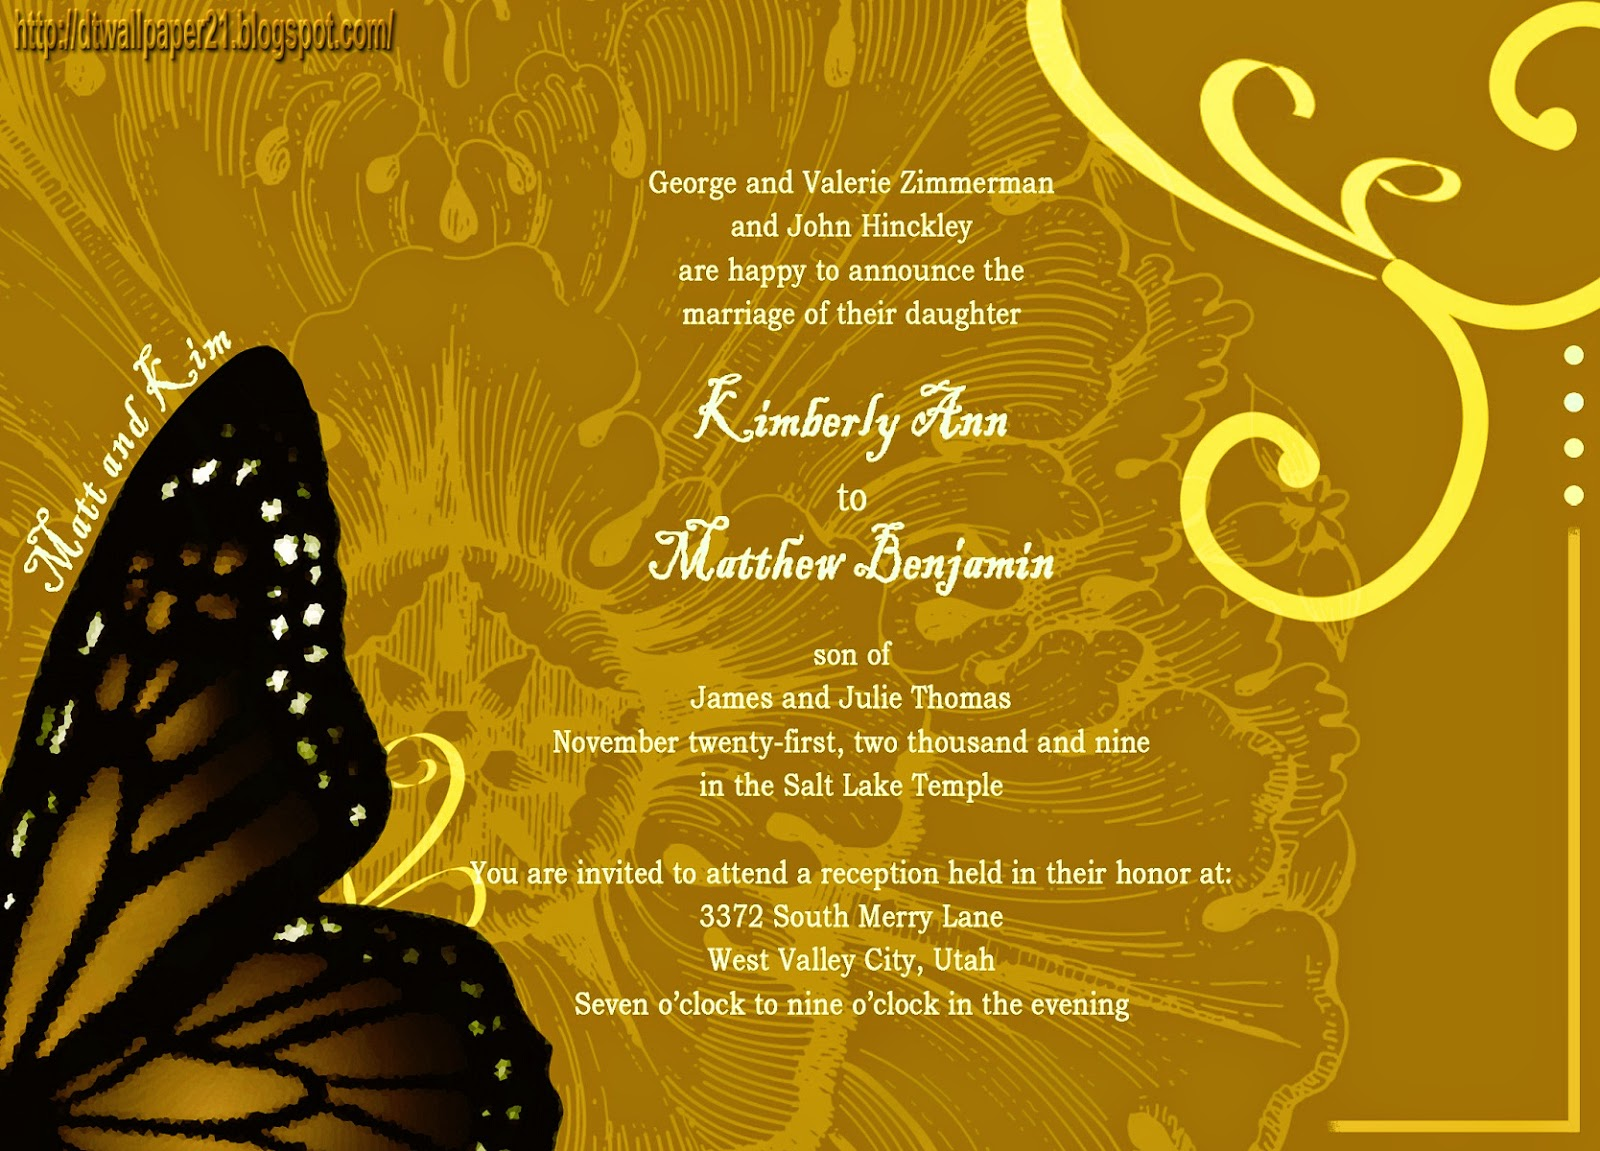 Wedding Bible Verses For Invitation Cards: Background Screensavers: Wedding